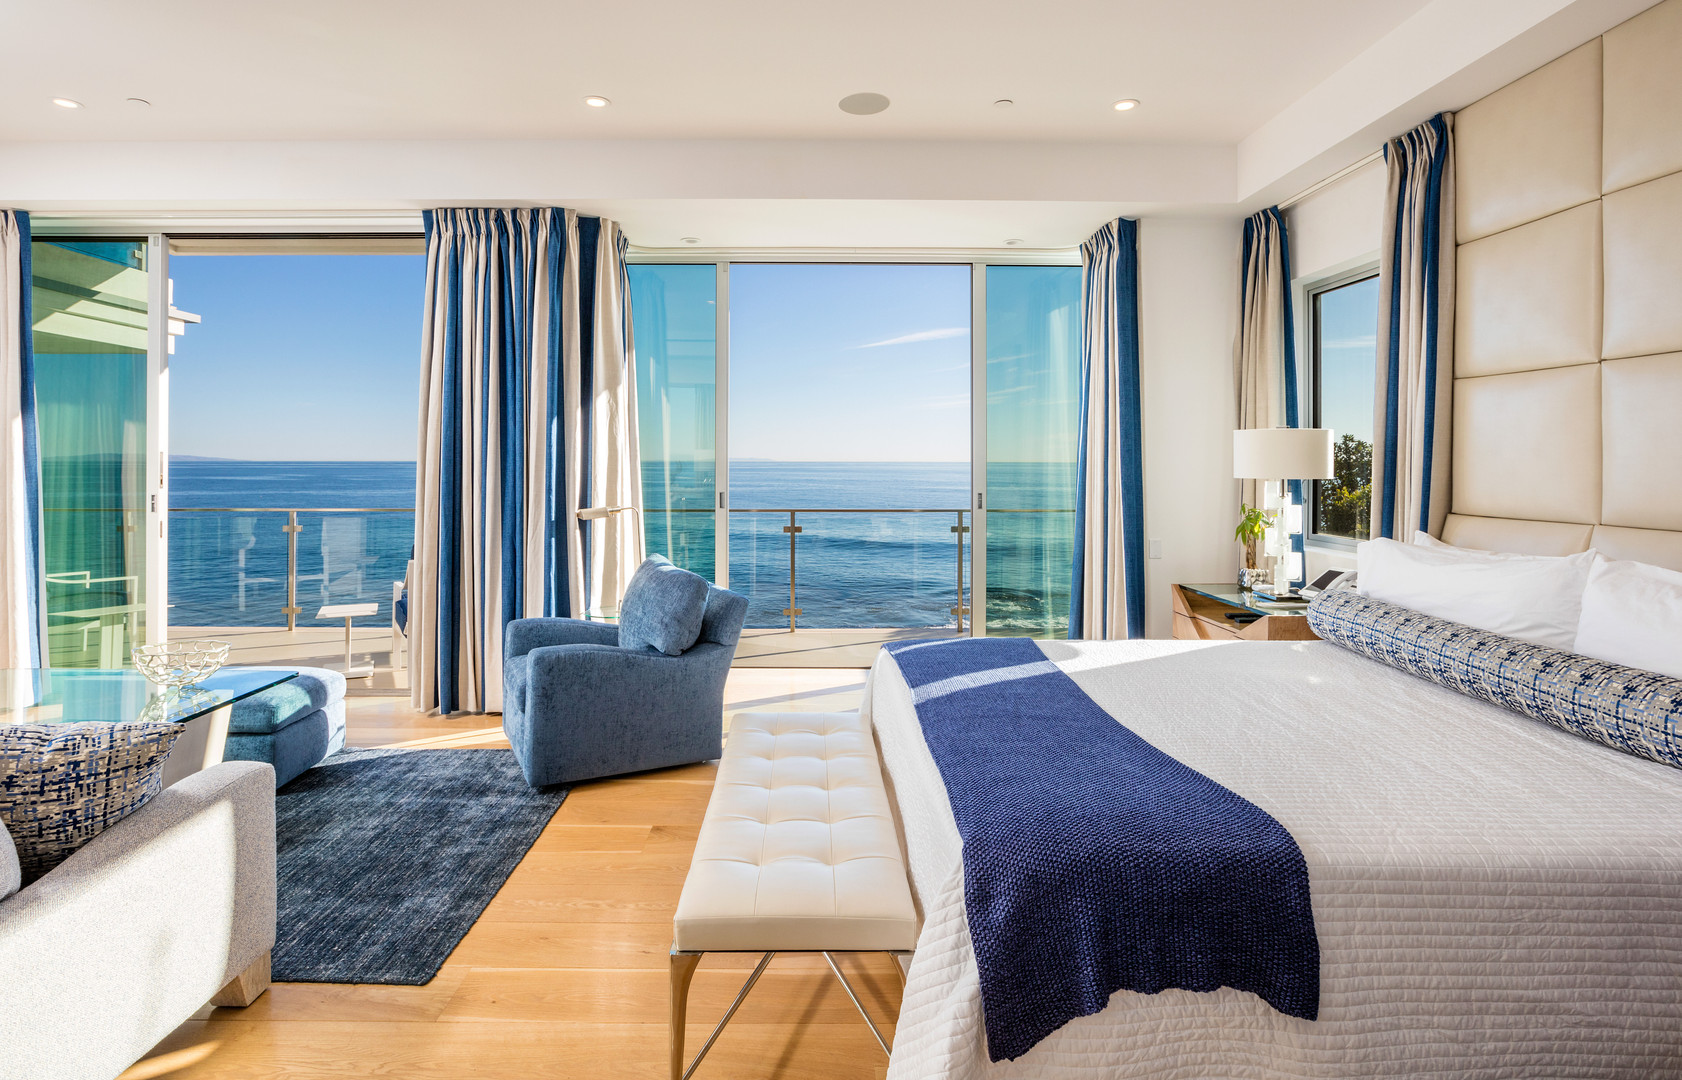 MALIBU BEACH HOUSE - MASTER BEDROOM